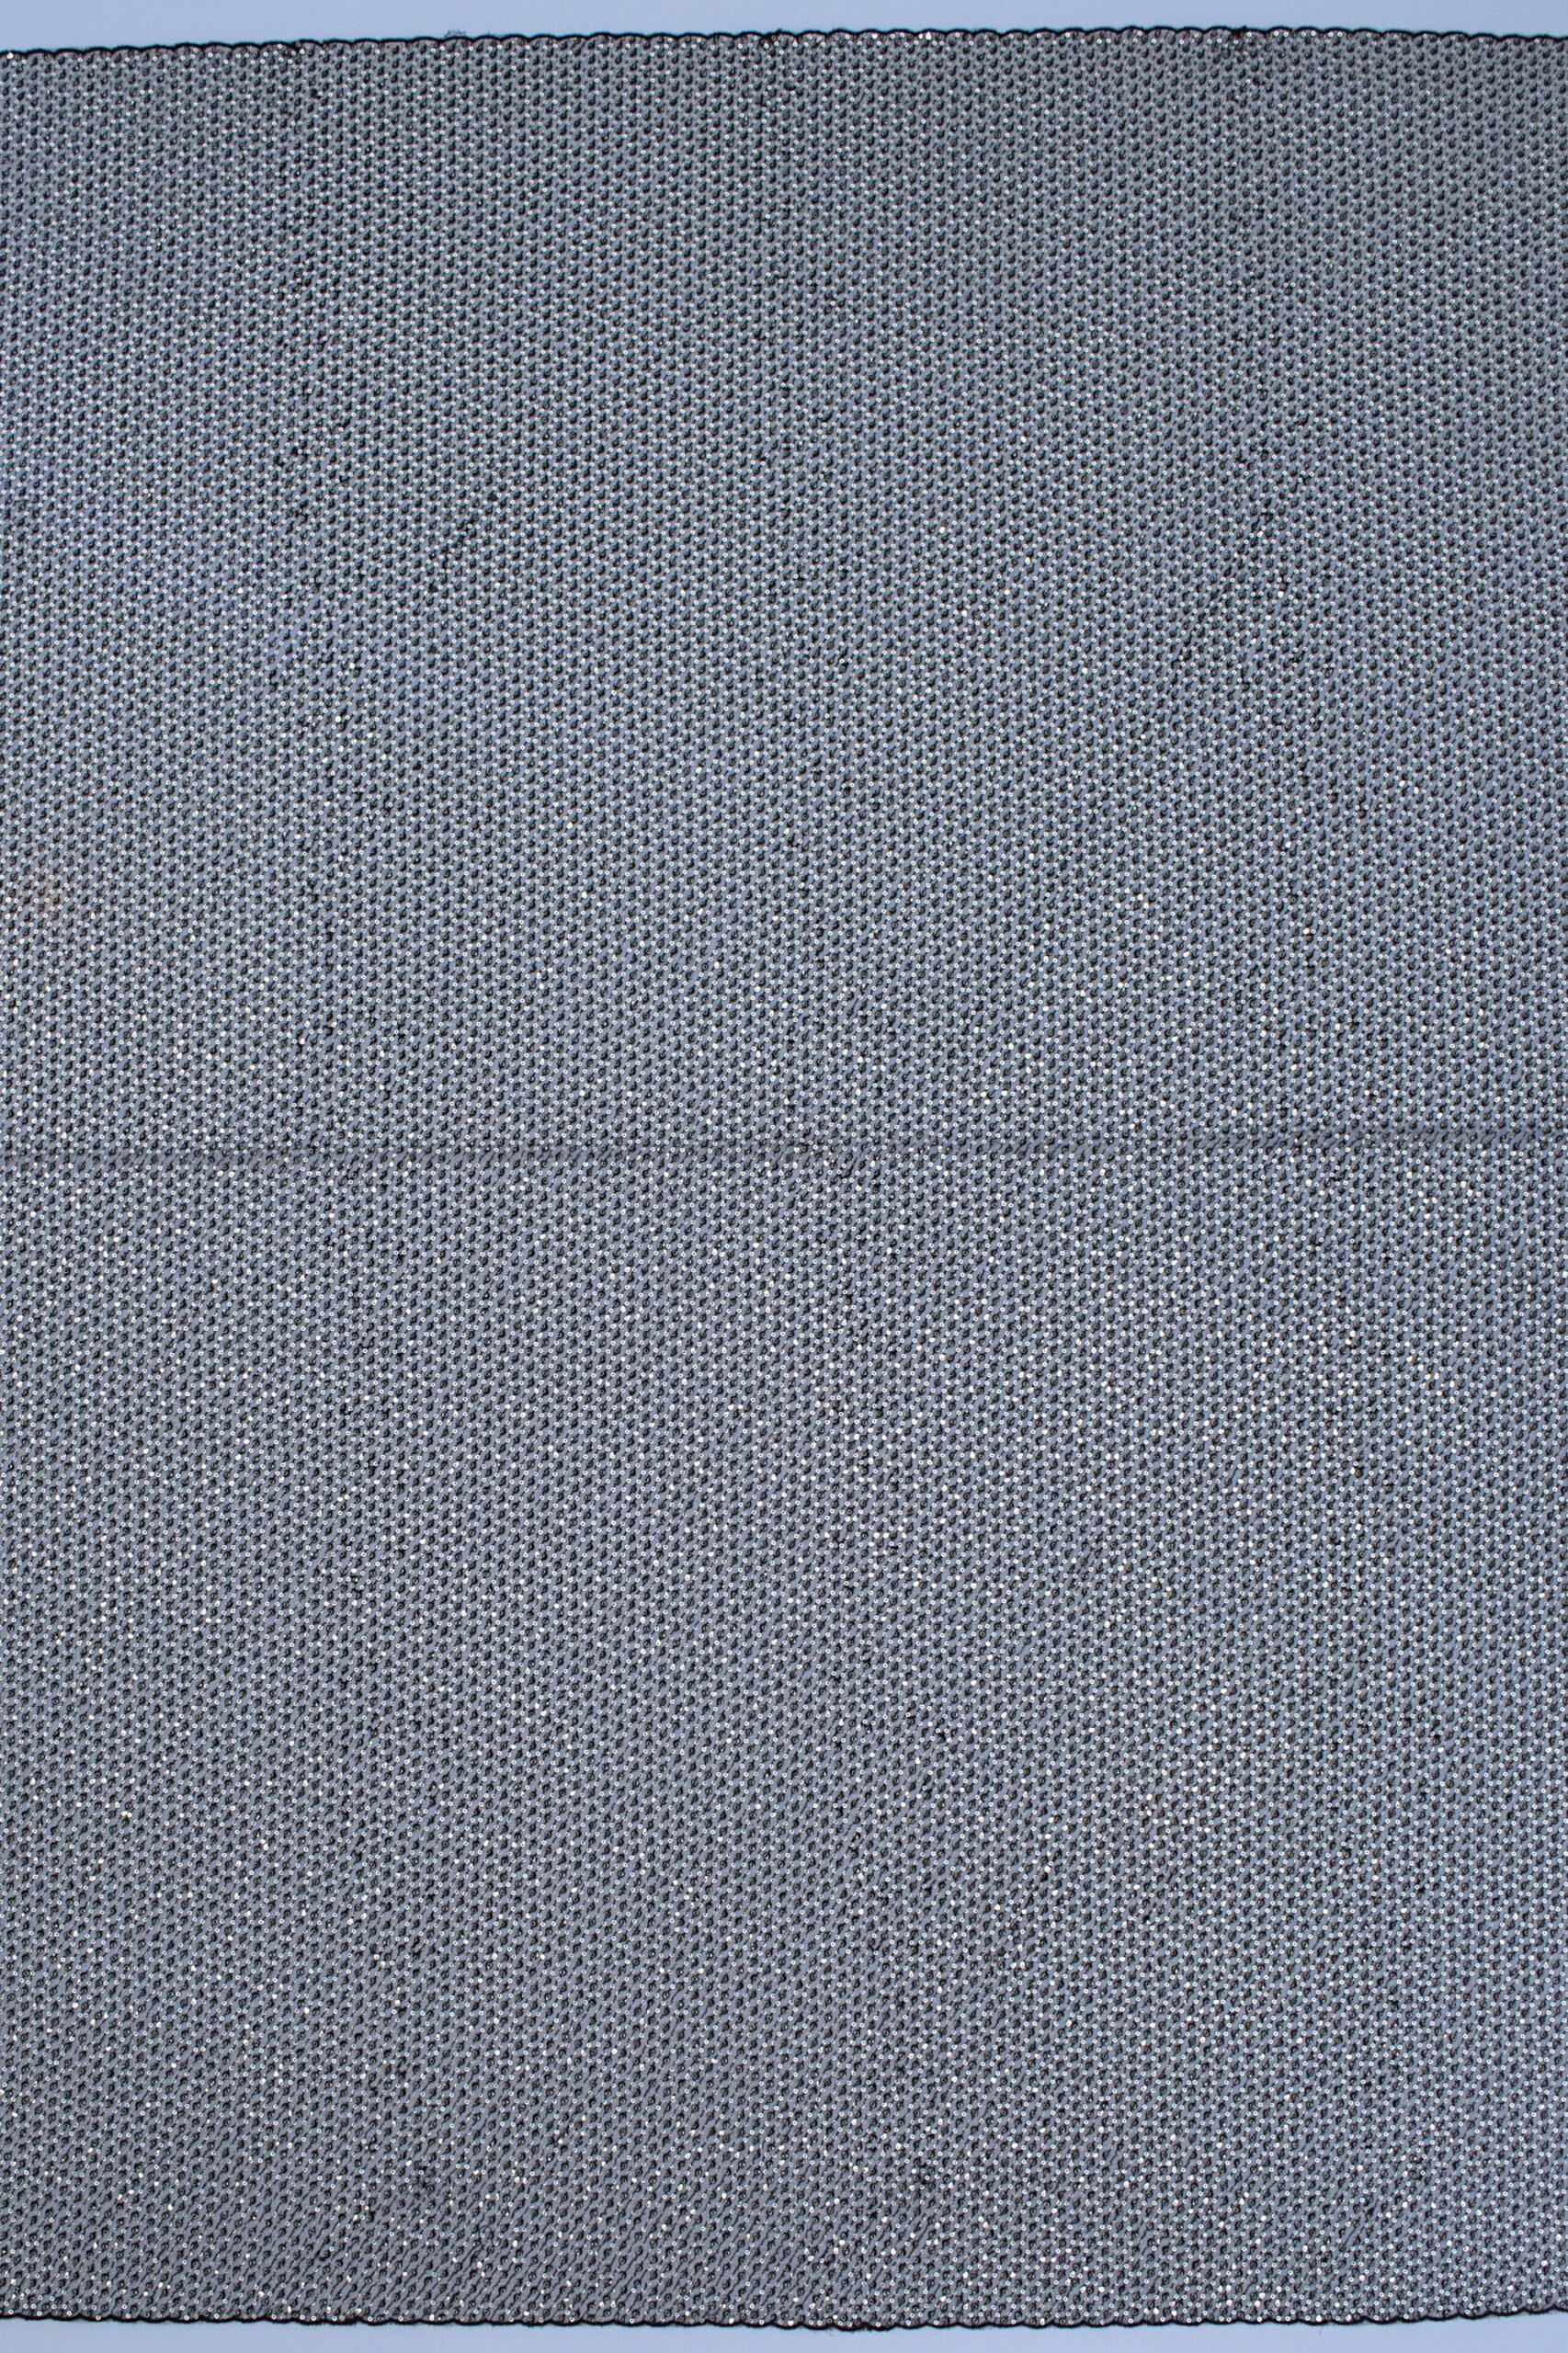 AM34308-2(K)QUF2-N44